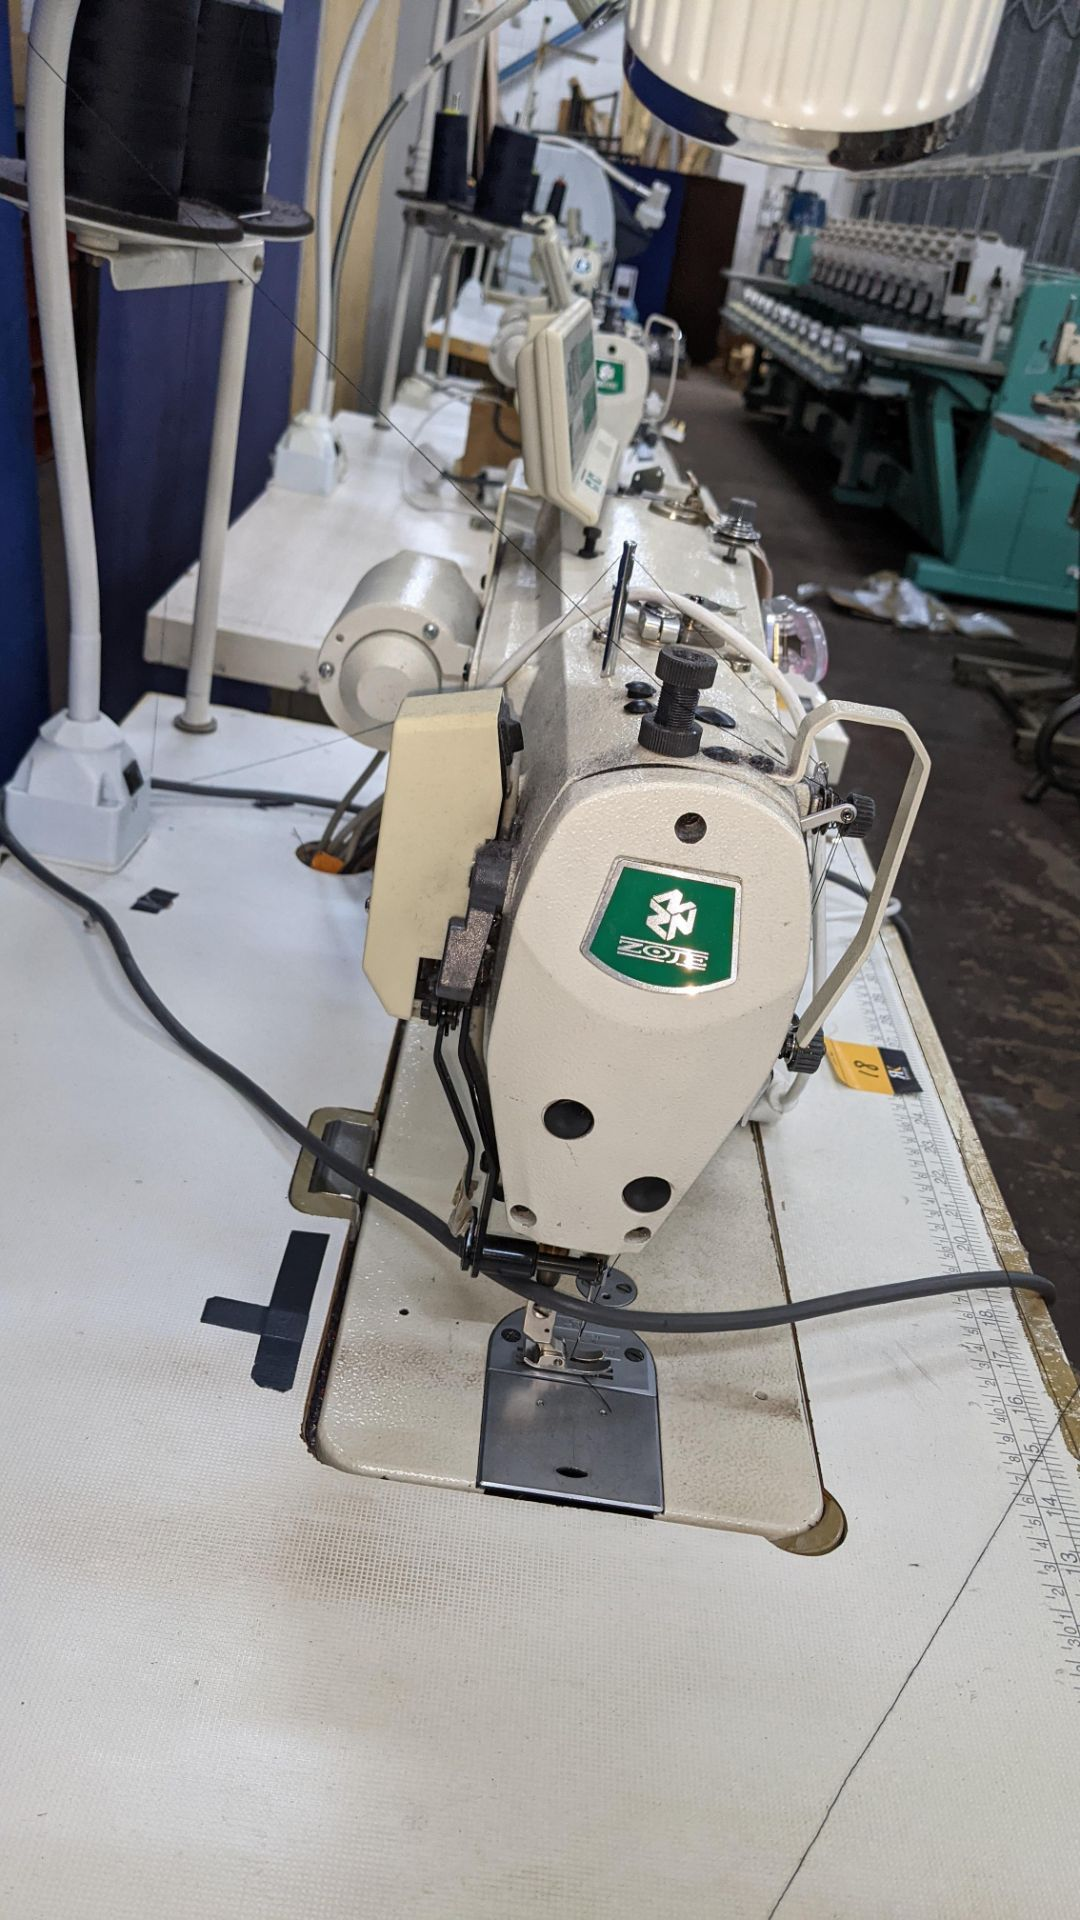 Zoje model ZJ9800A-D3B/PF lockstitch sewing machine with model WR-501 digital controller - Image 10 of 20